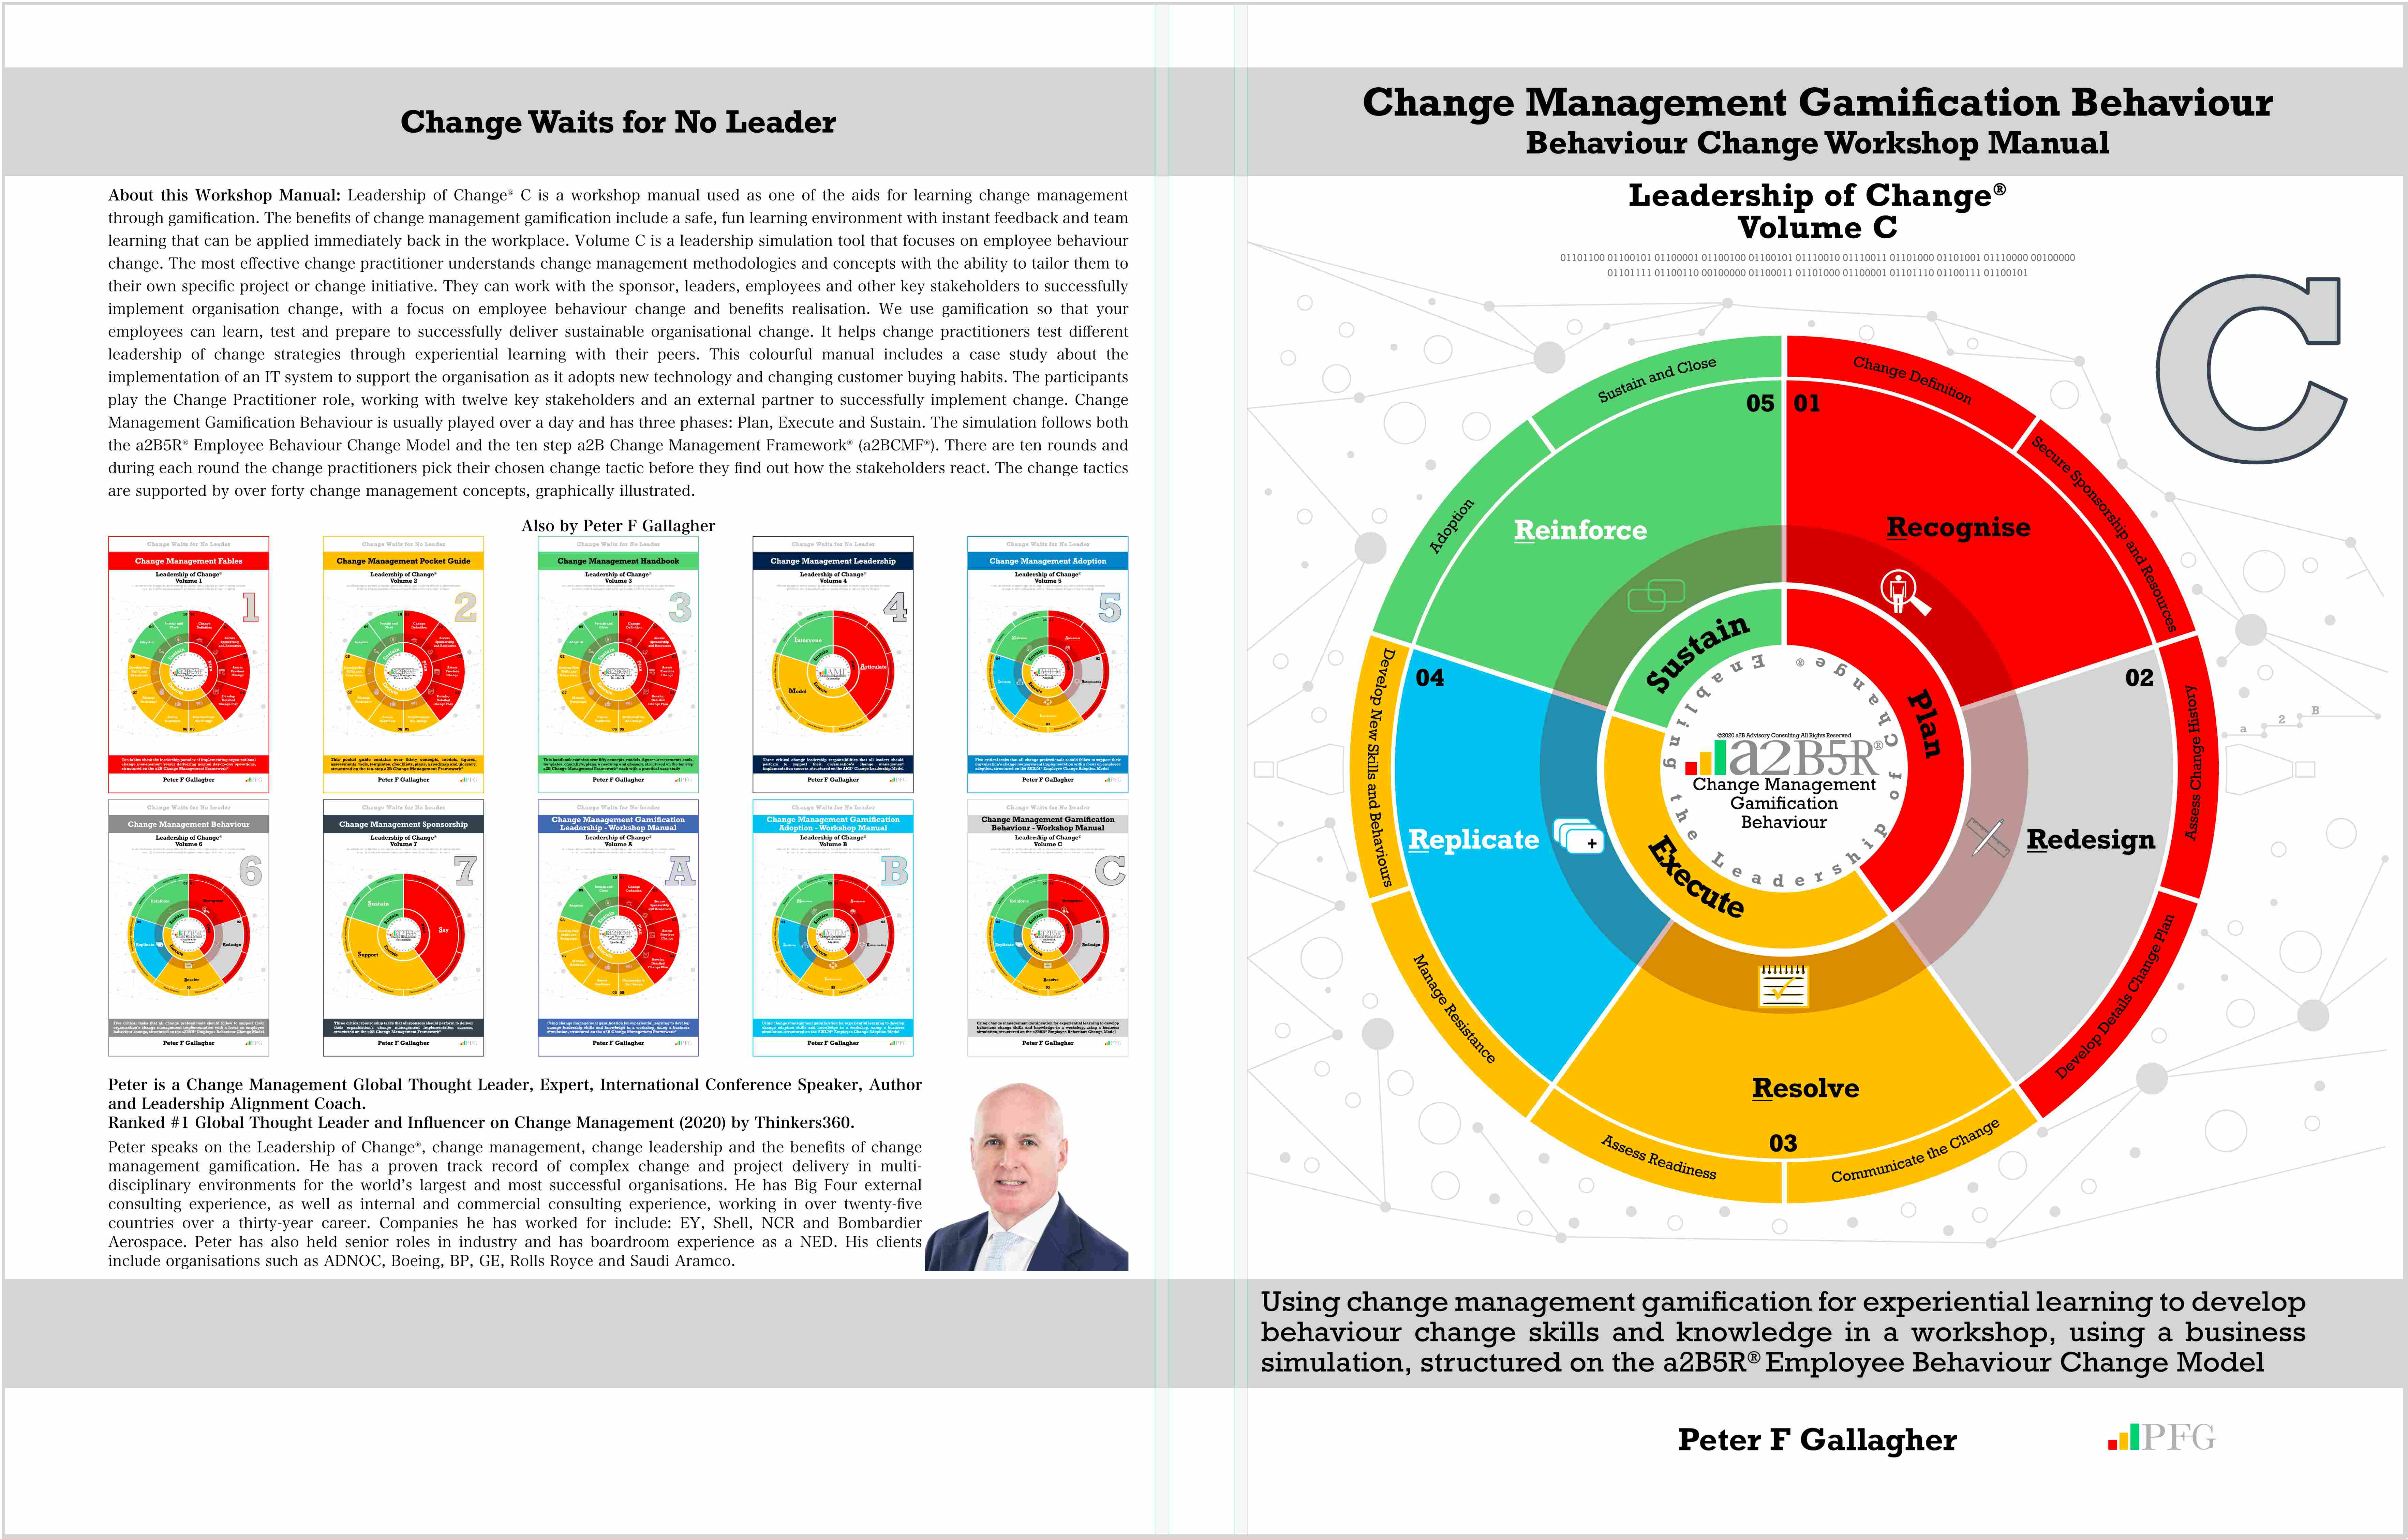 Change Management Gamification Behaviour - Leadership of Change® Volume C, Change Management Book, C